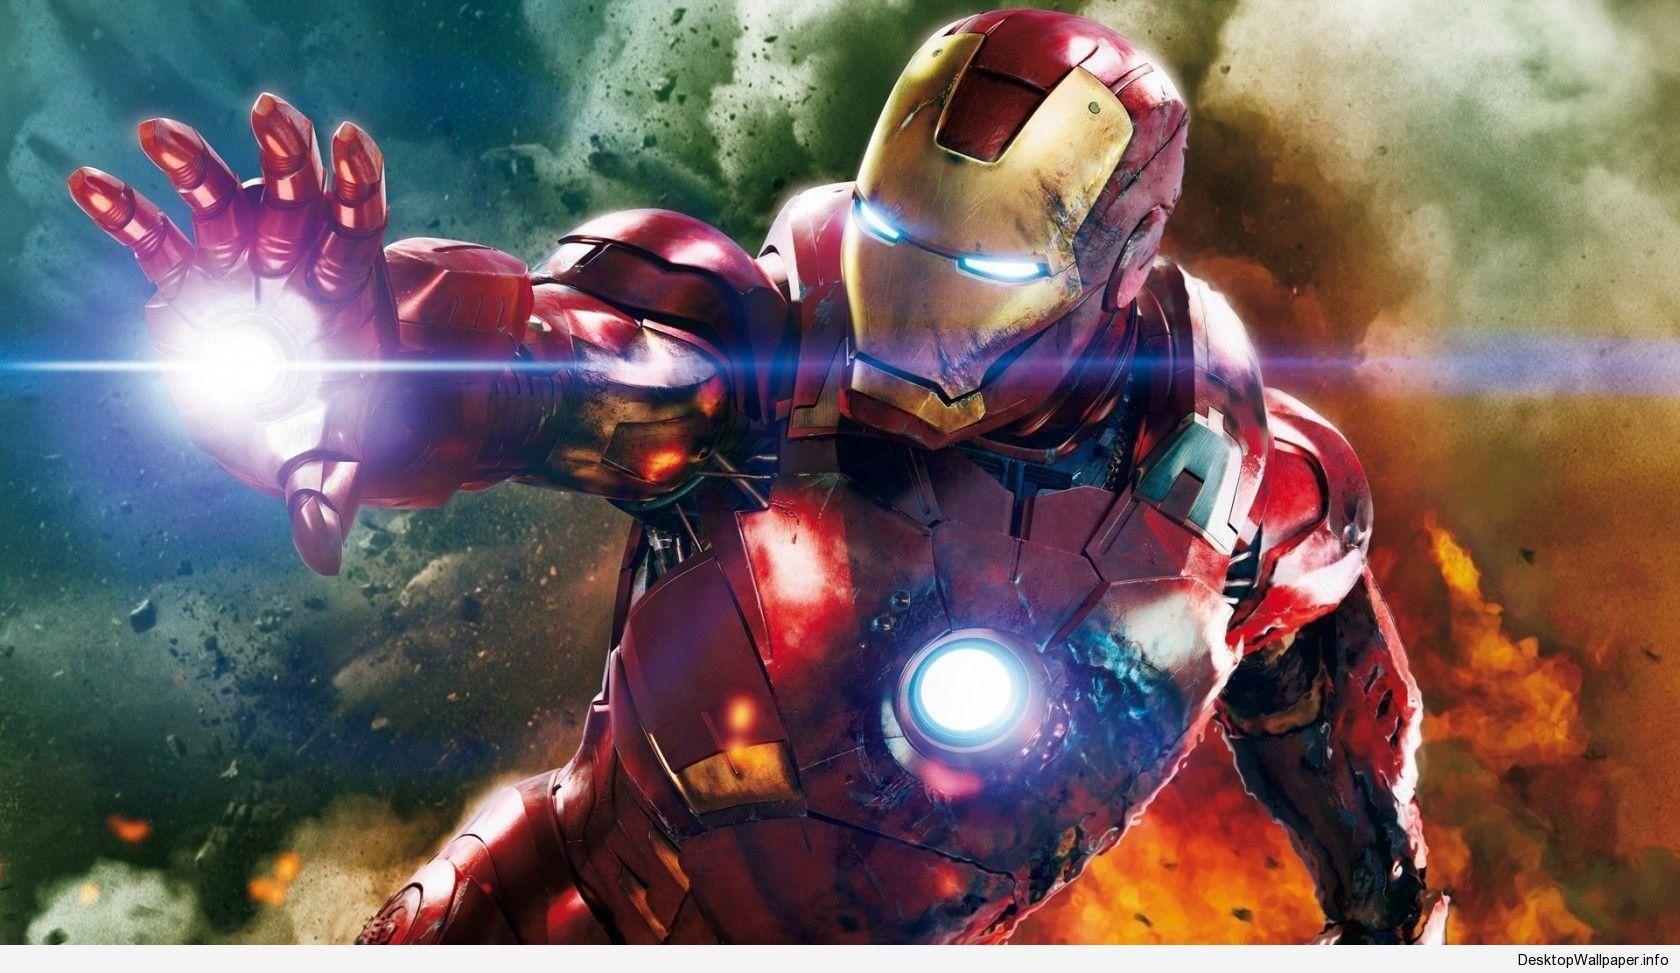 Iron Man 3 Wallpaper Hd 1080p Http Desktopwallpaper Info Iron Man 3 Wallpaper Hd 1080p 9168 Fondo De Pantalla De Iron Man Los Vengadores Superheroes Marvel